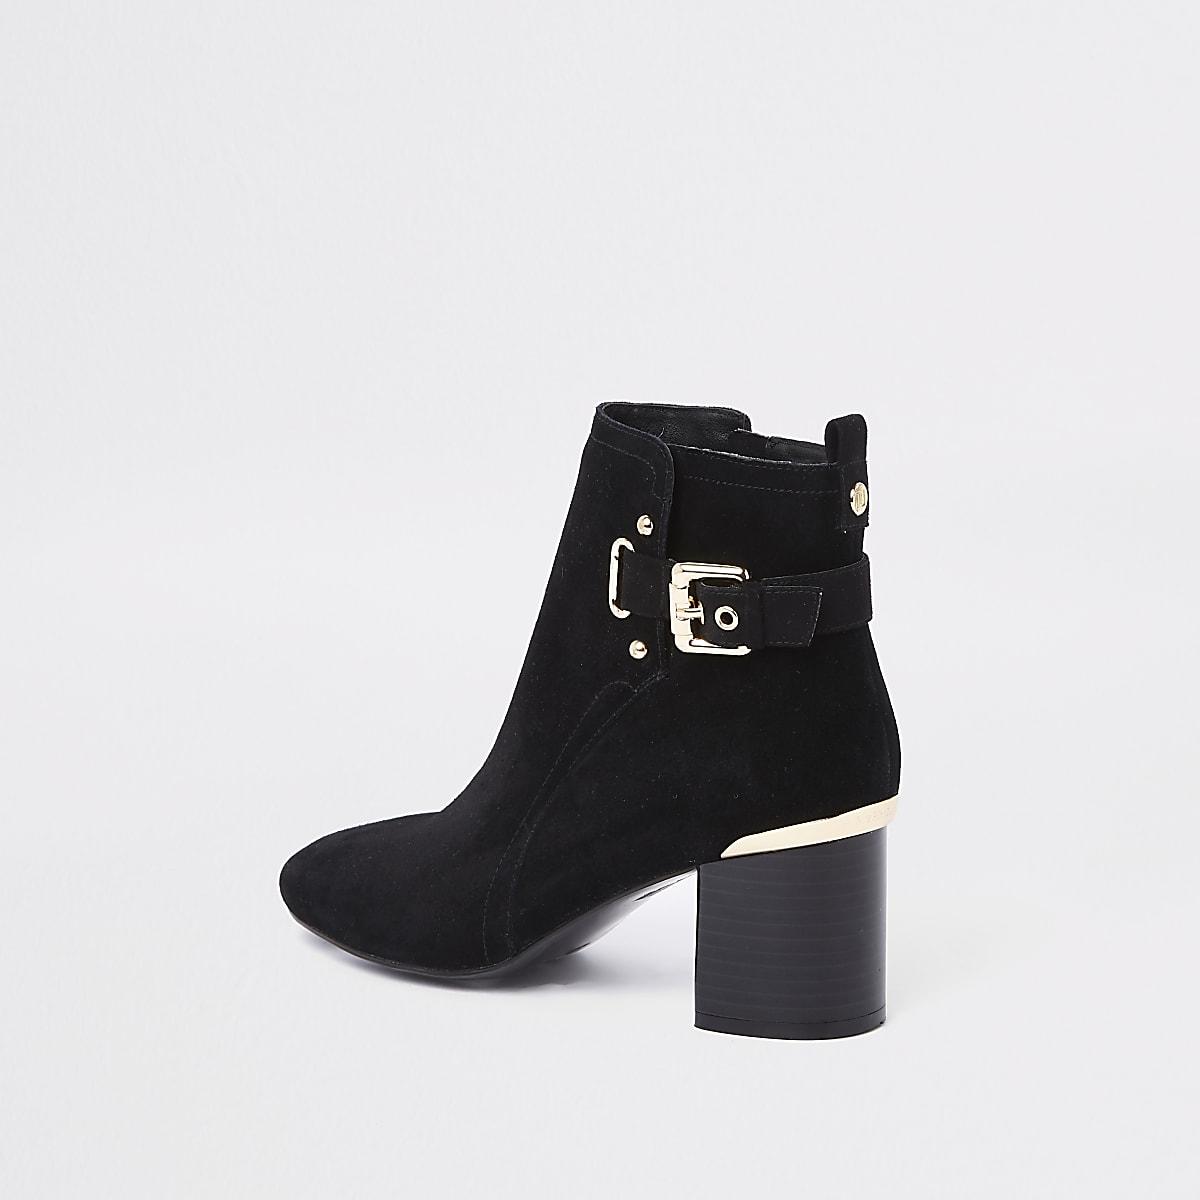 c14bebb90080 Black suede block heel ankle boots - Boots - Shoes   Boots - women